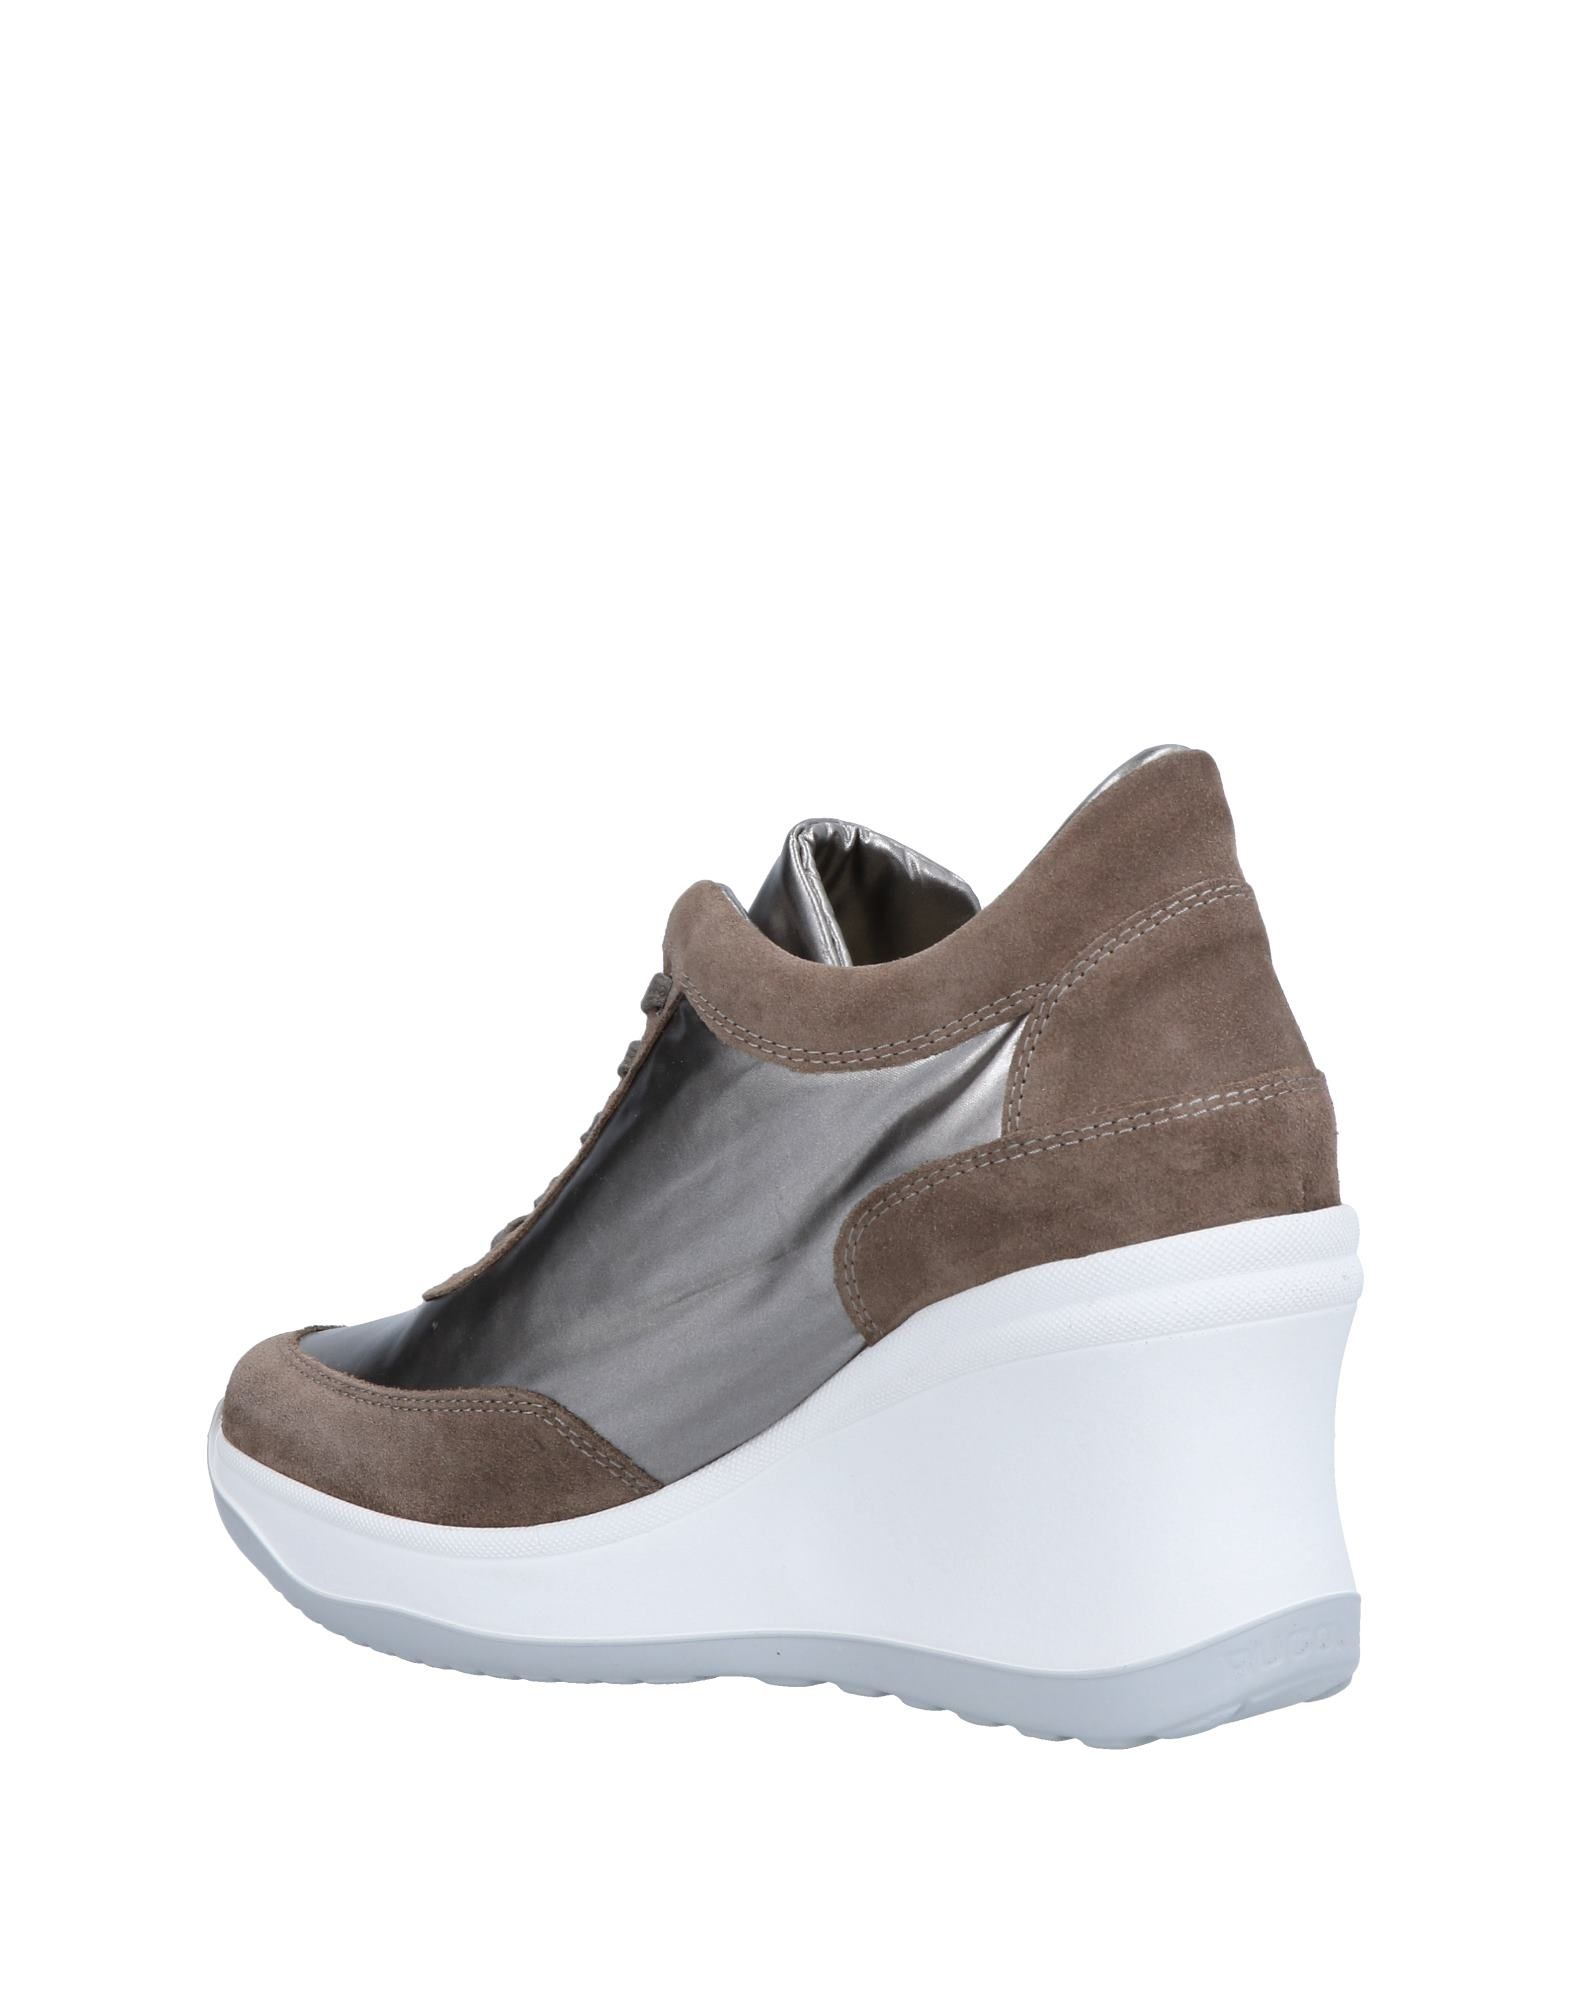 Agile By Rucoline Sneakers Damen  Schuhe 11496596SO Gute Qualität beliebte Schuhe  2fe8dd